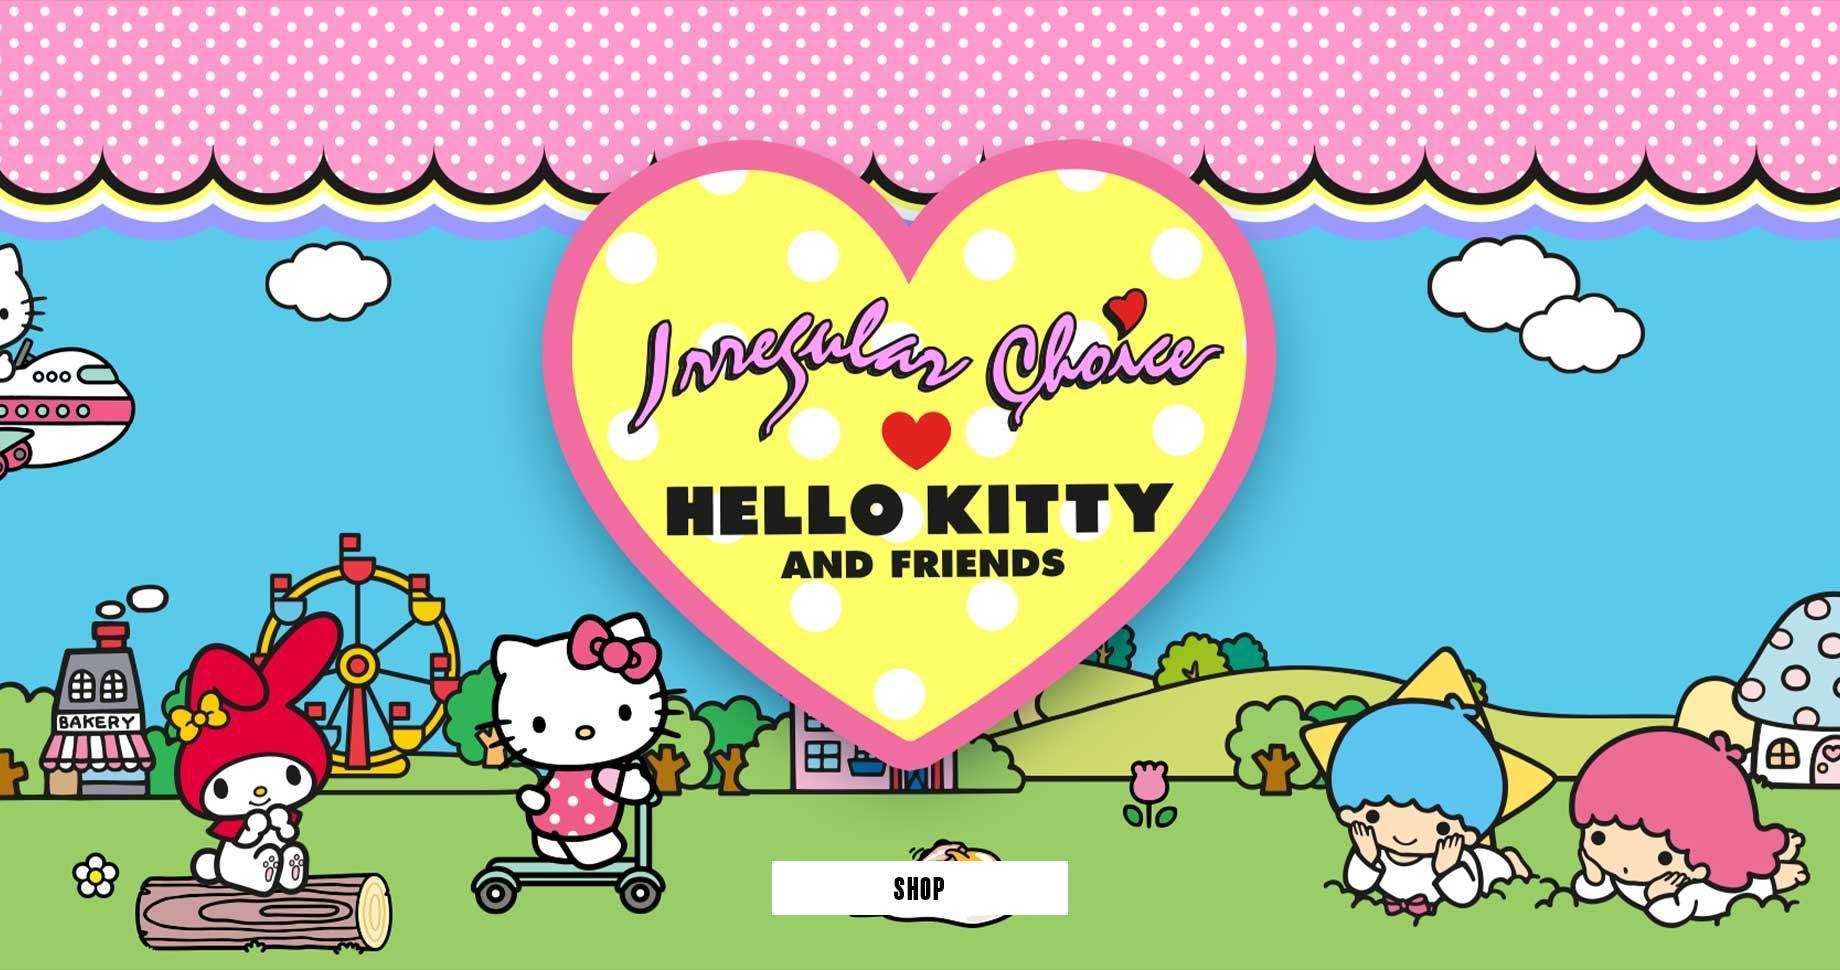 Irregular Choice x Hello Kitty